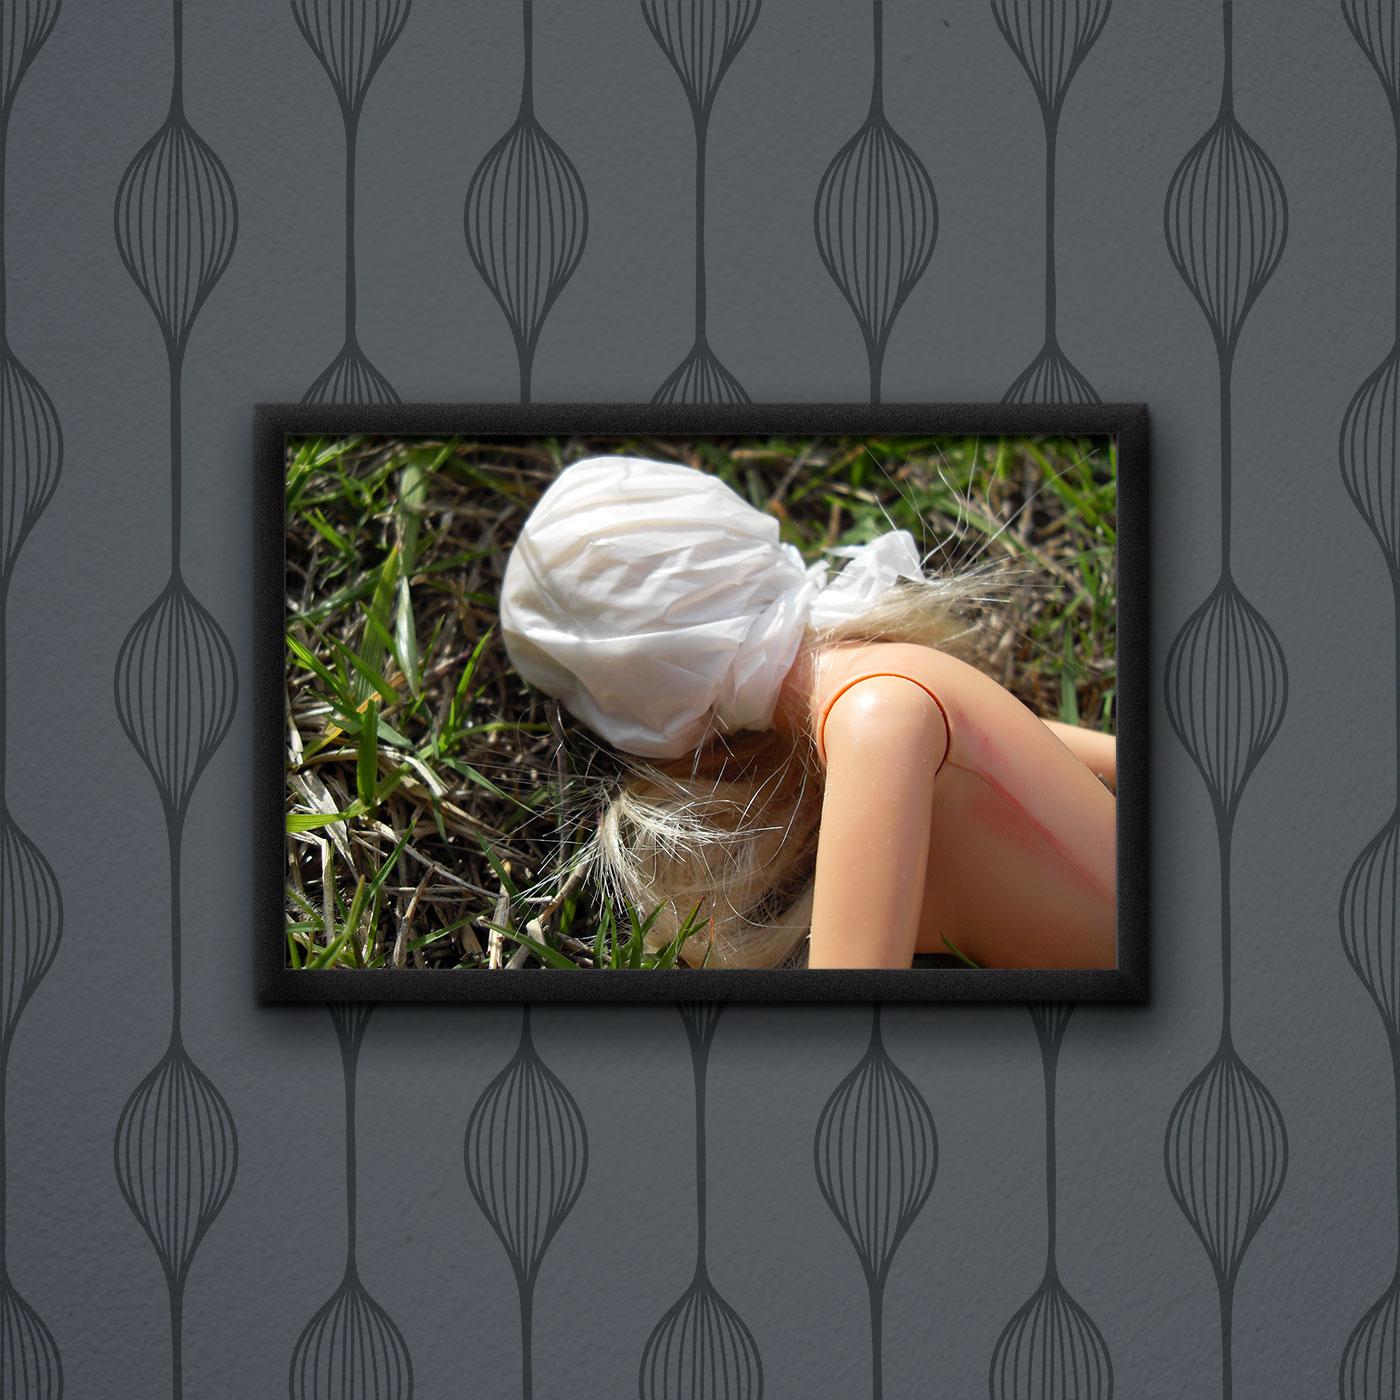 TBM002BO2_BarbieMurdersBondage_ByWildeDesigns_mockup01